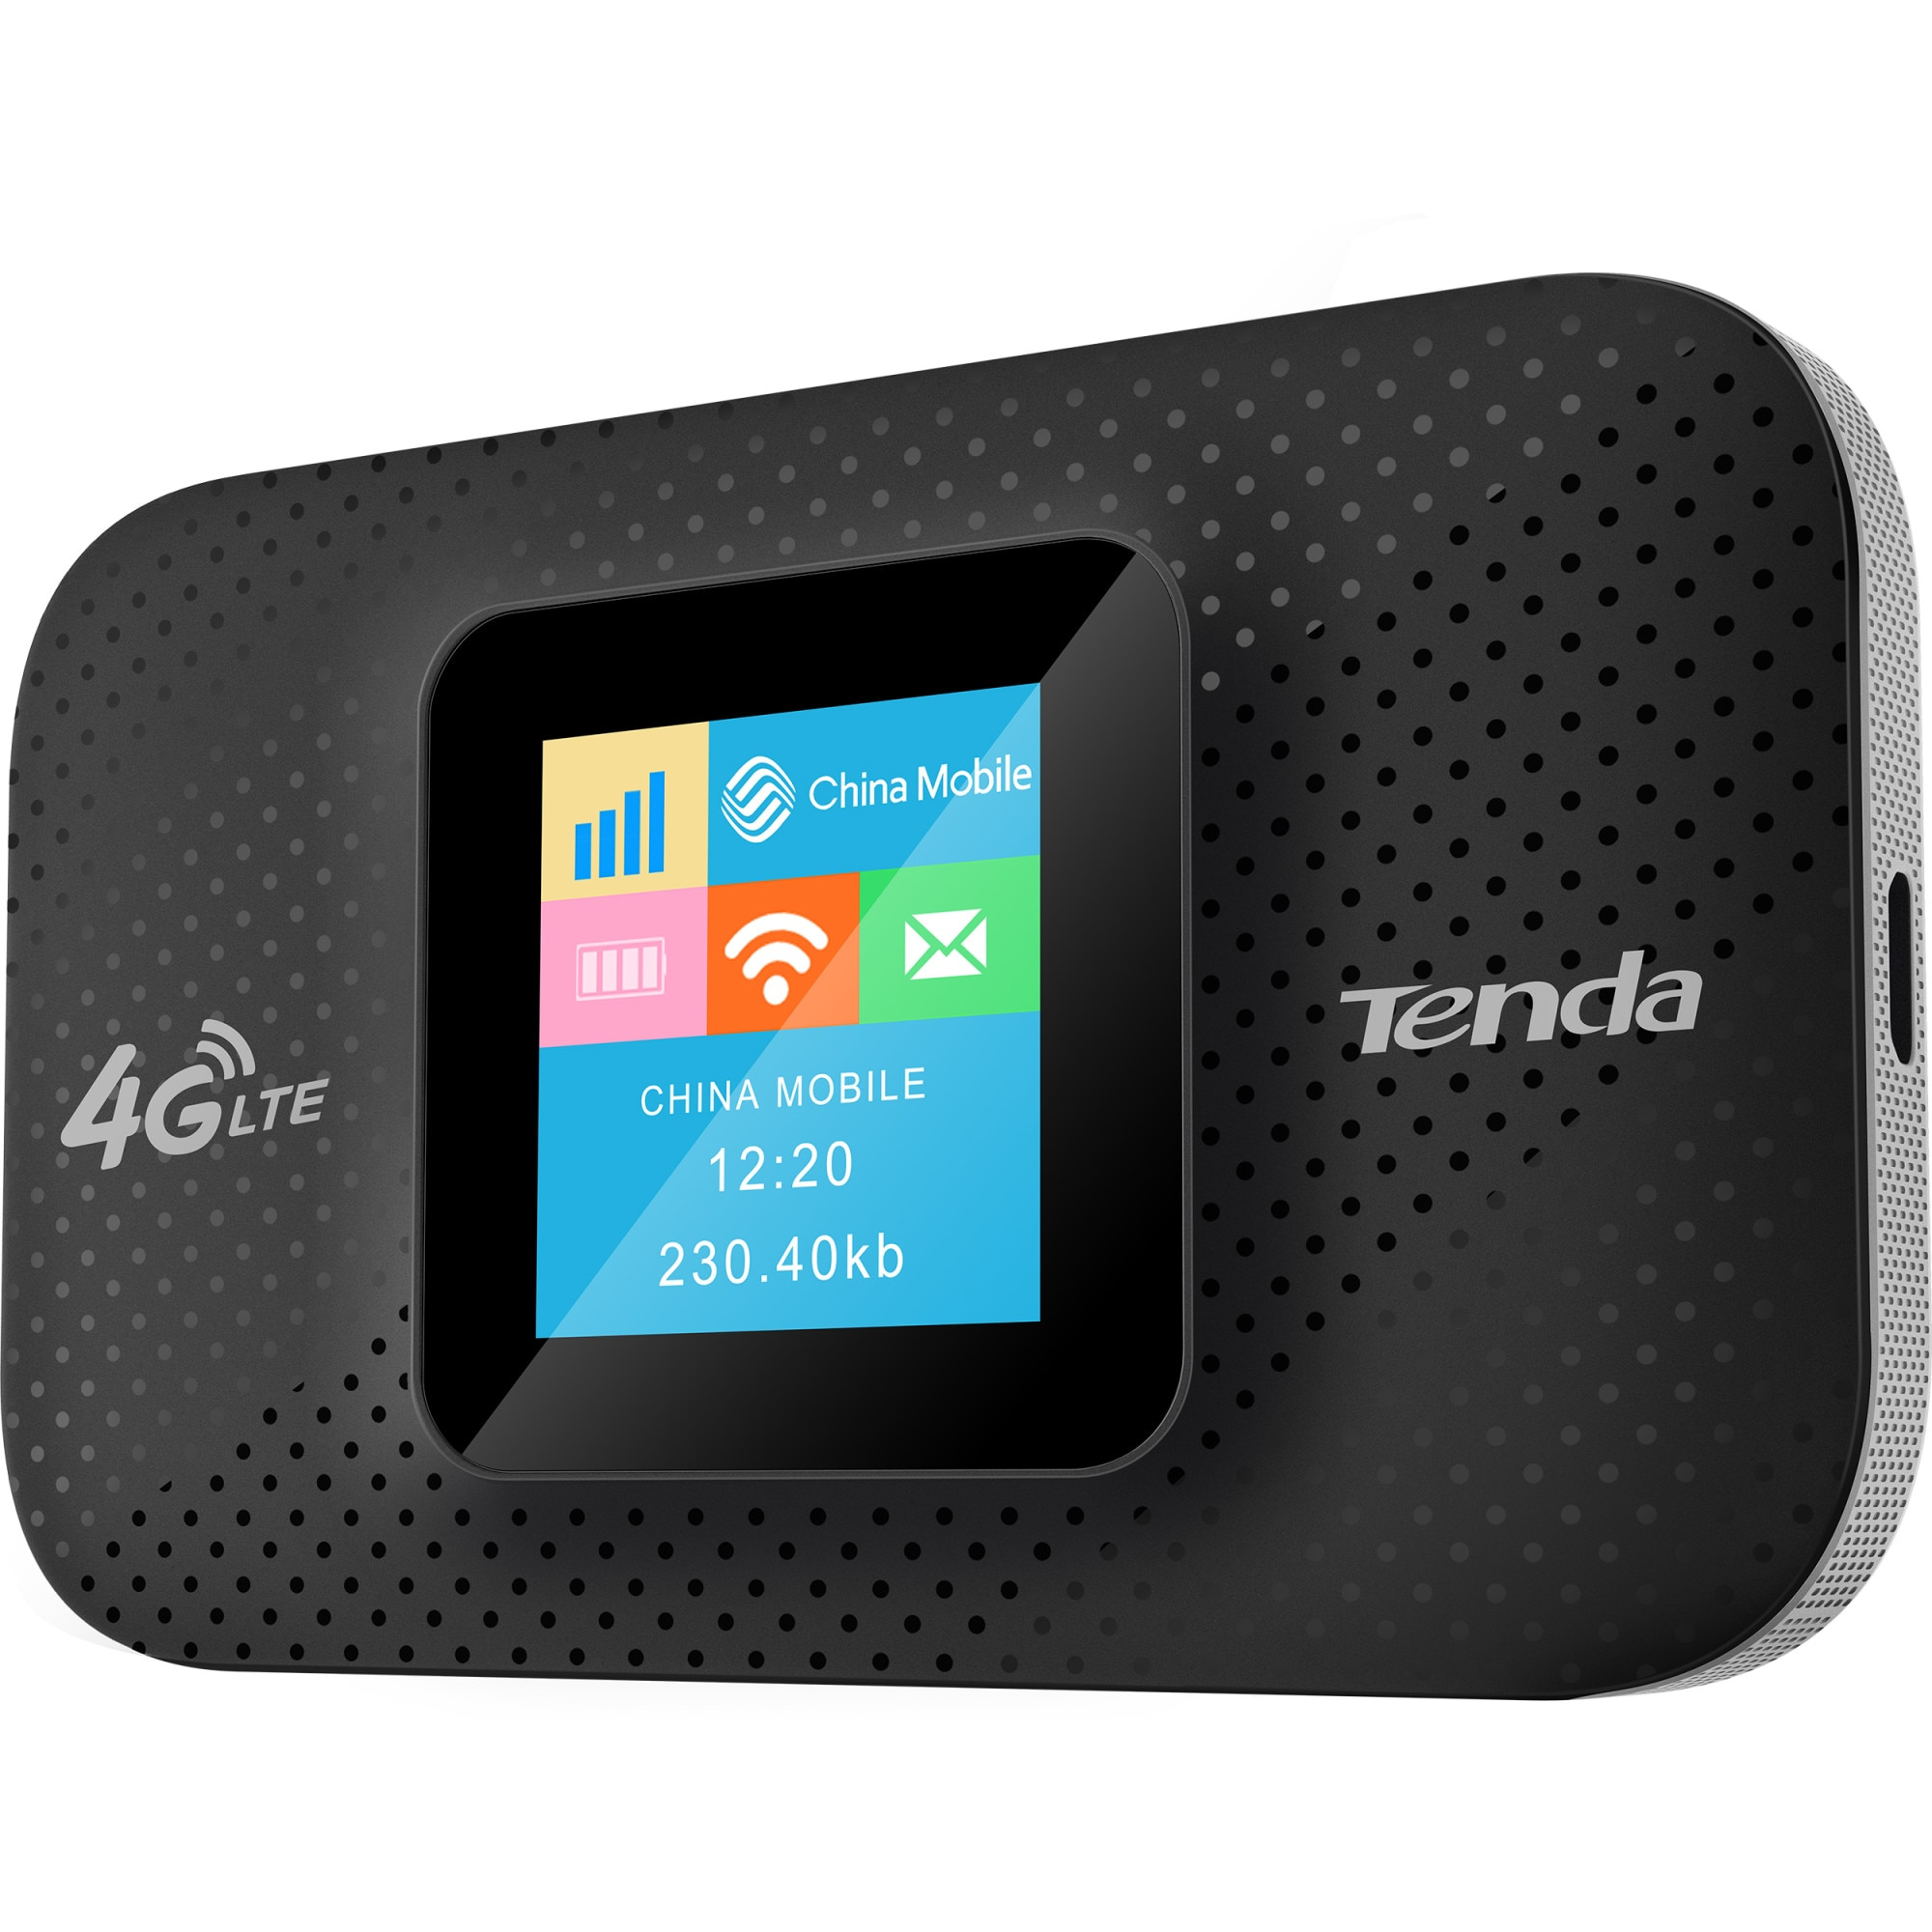 Fotografie Router wireless Tenda 4G185, 4G/3G, Portabil, 150 Mbps, Display OLED, Baterie 2100mAh